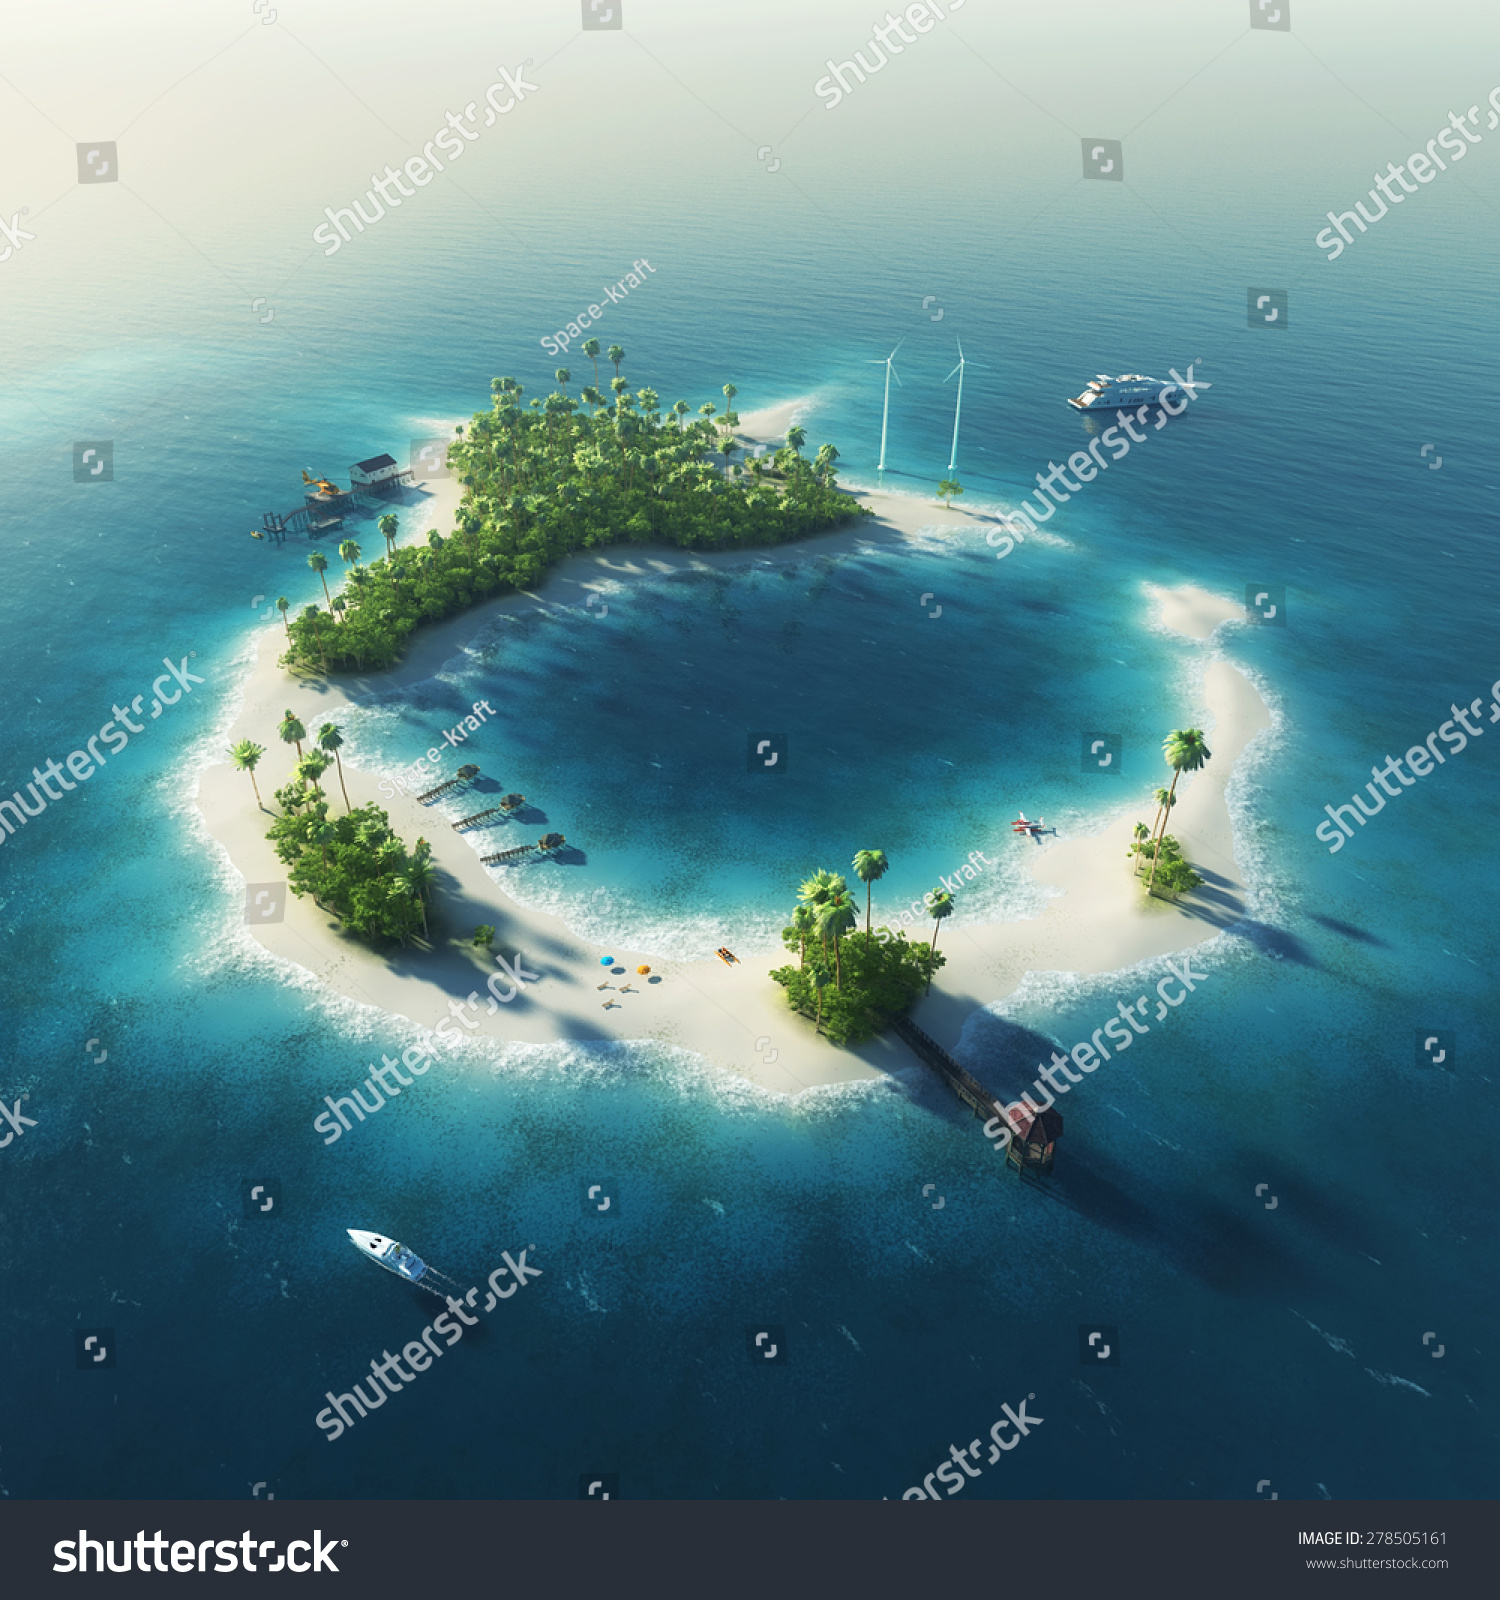 Tropical Island Paradise: Private Island Paradise Summer Tropical Island Stock